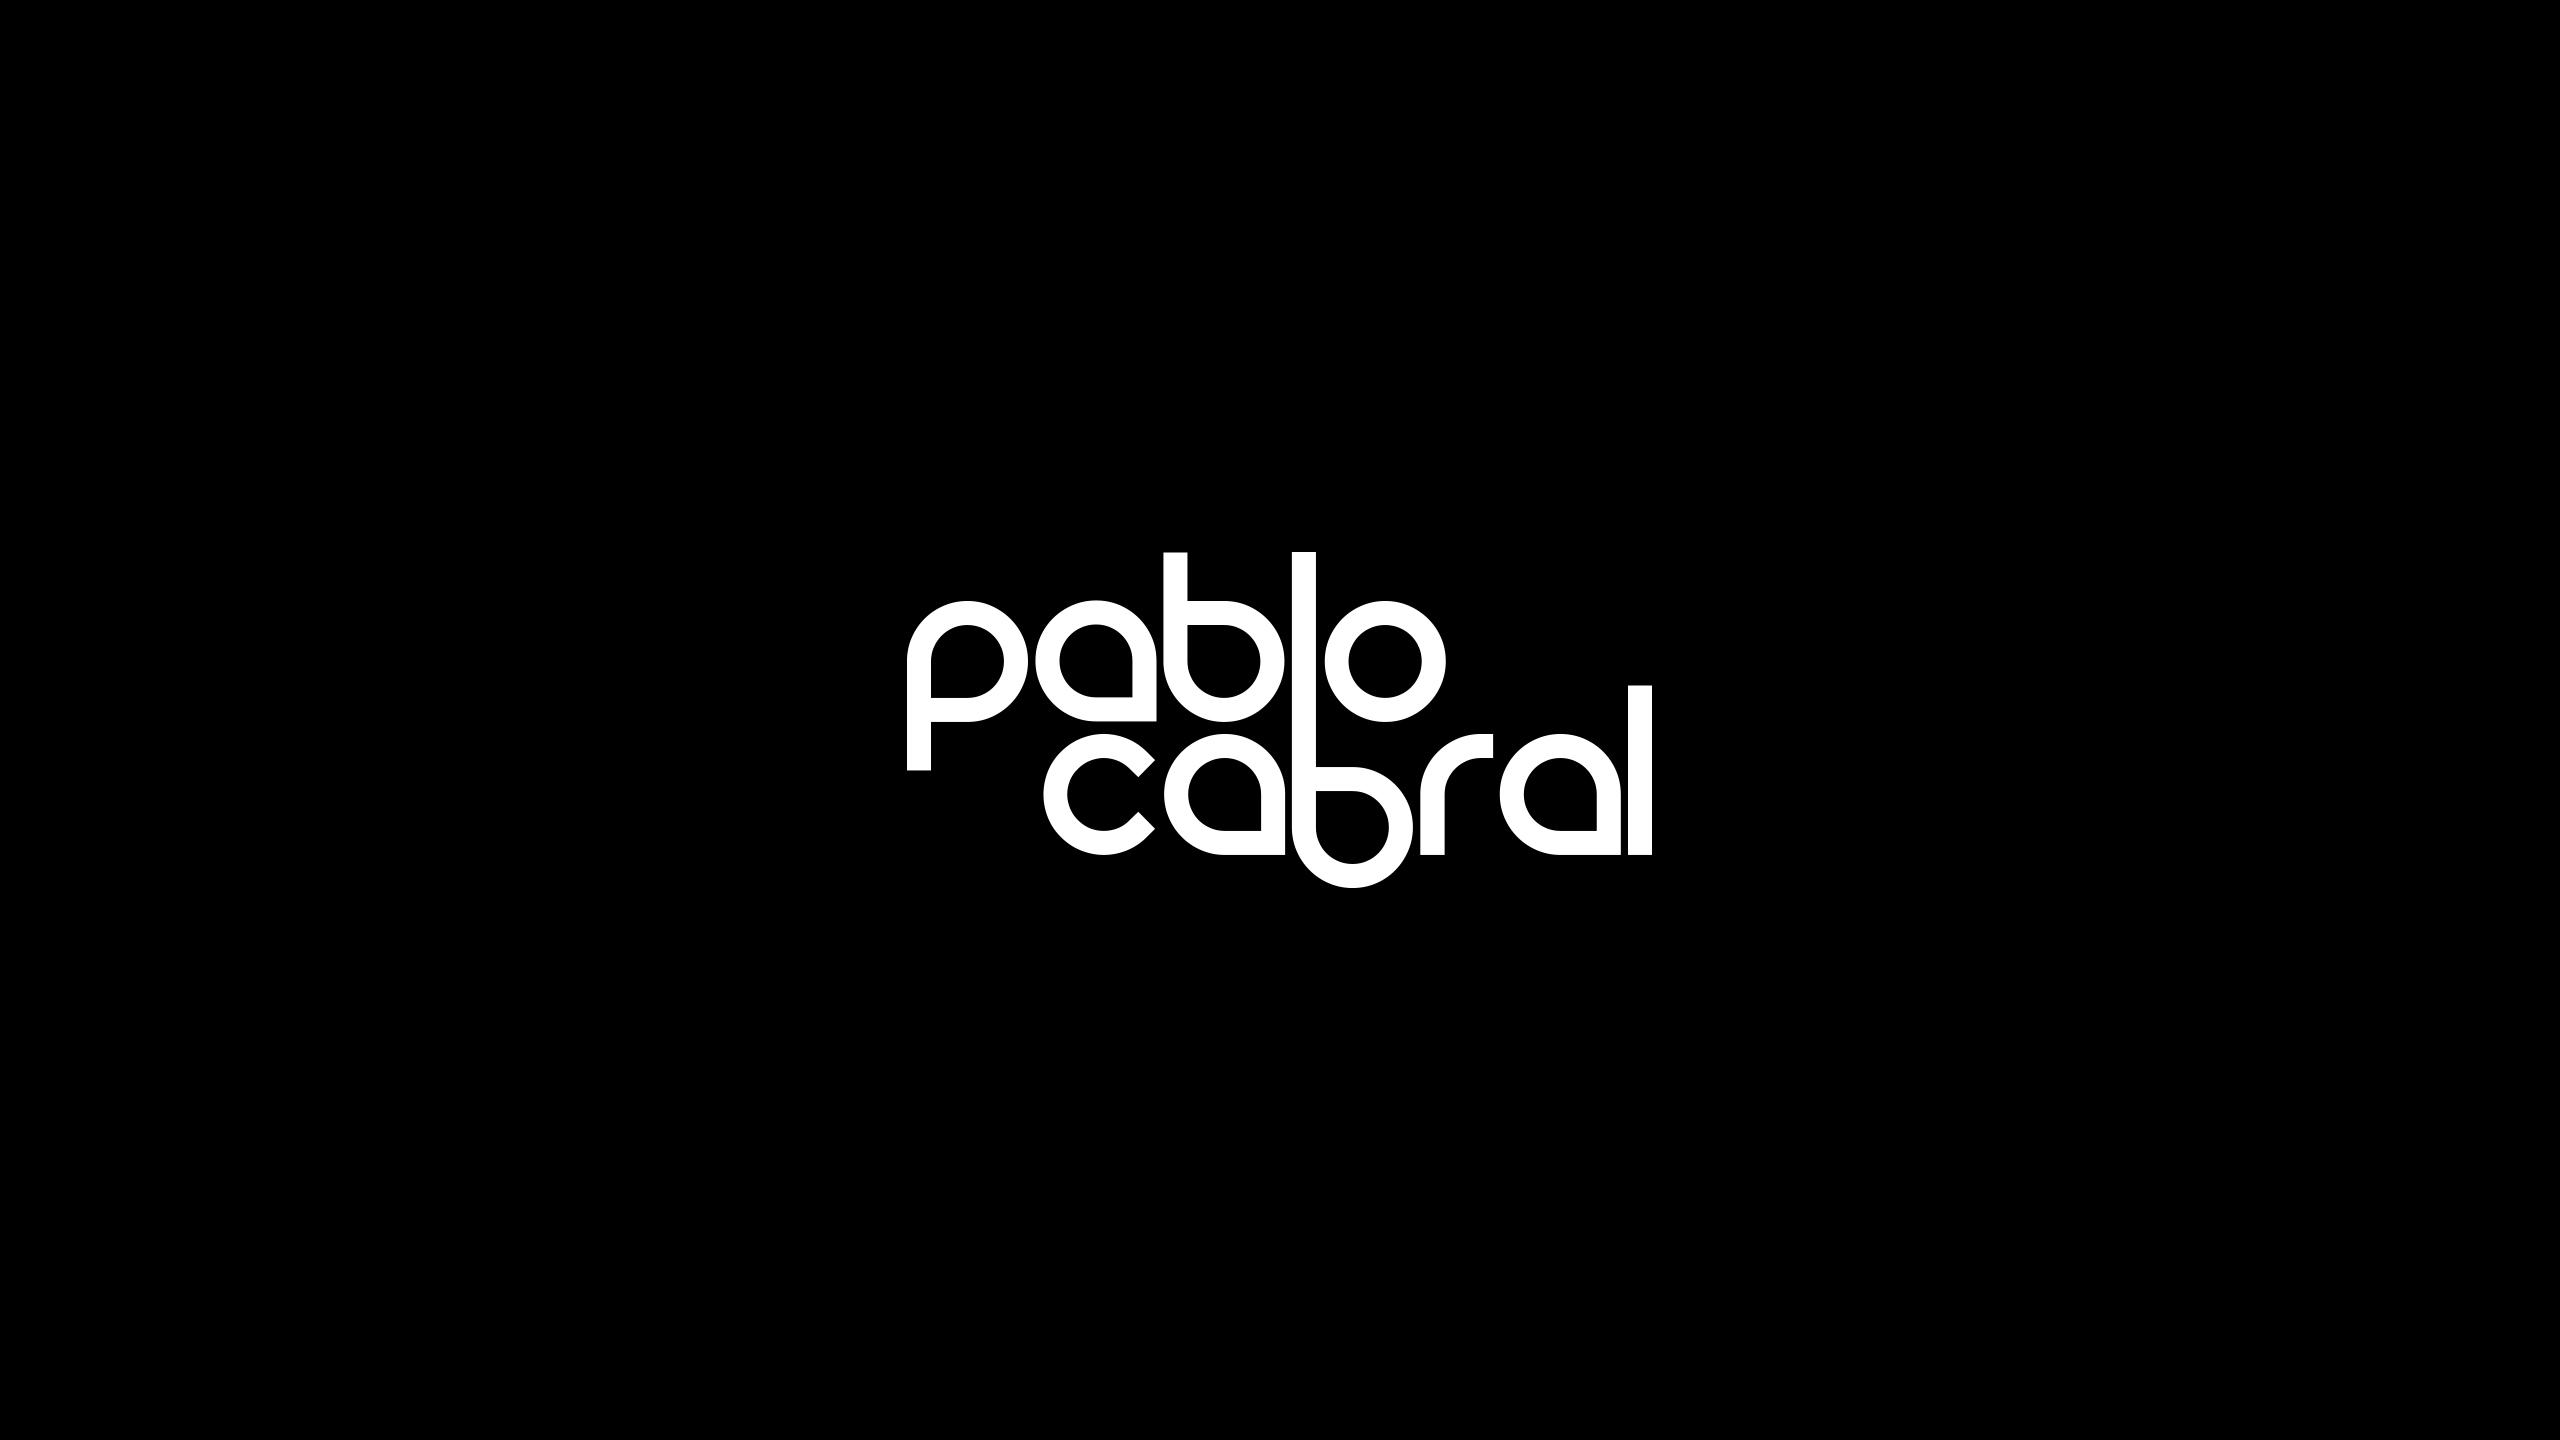 Google Ads: Completo por Pablo Cabral